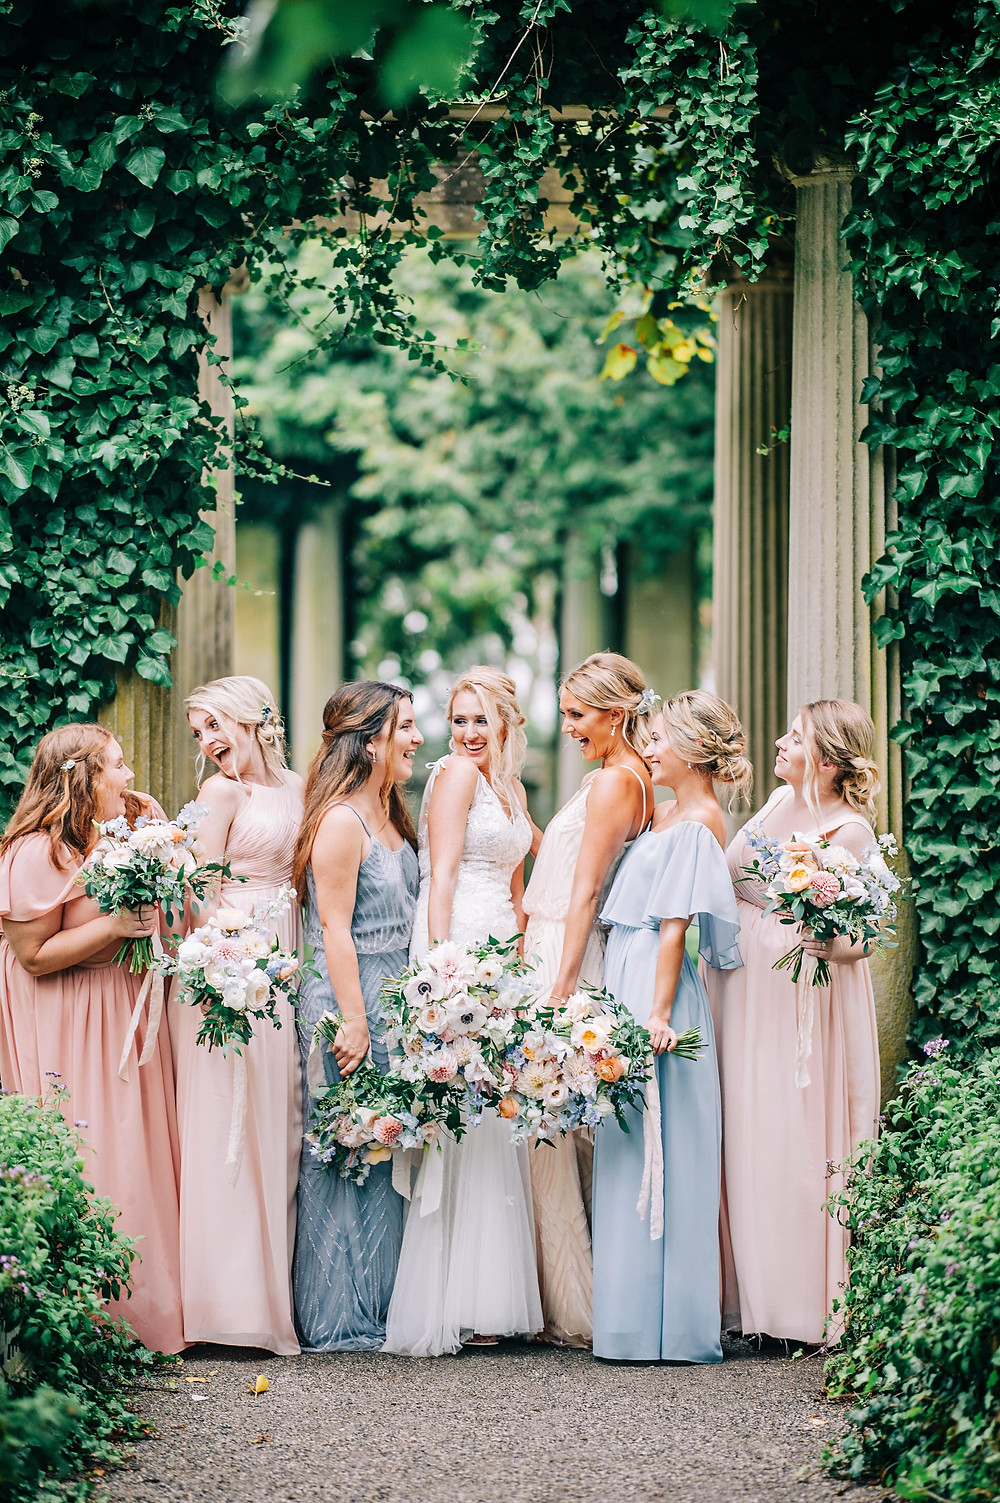 Blush & light blue pastel summer wedding photoshoot at Eolia Mansion, pastel color bridesmaids dresses